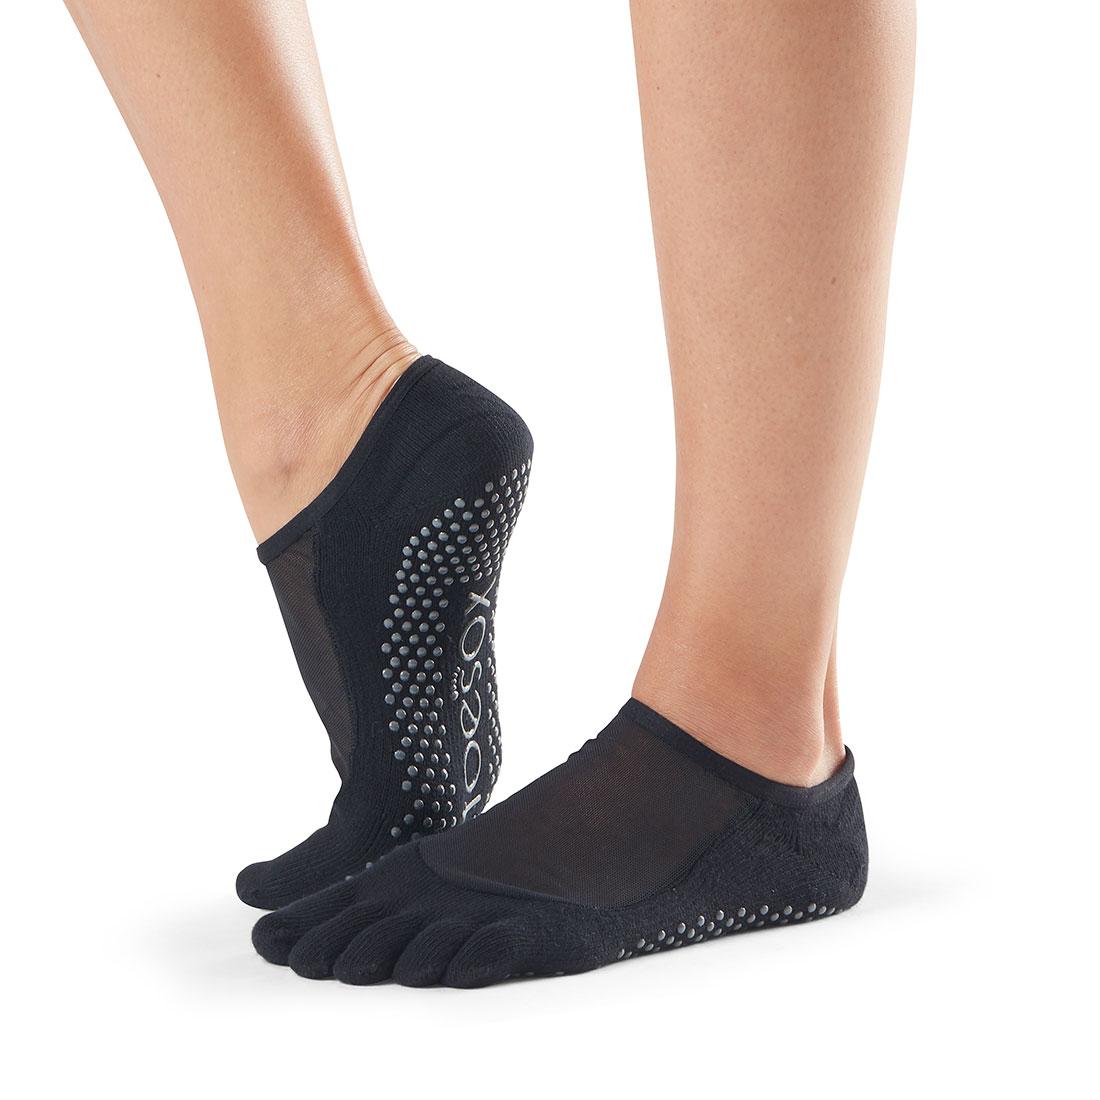 Yogasocken ToeSox Luna Full Toe Black